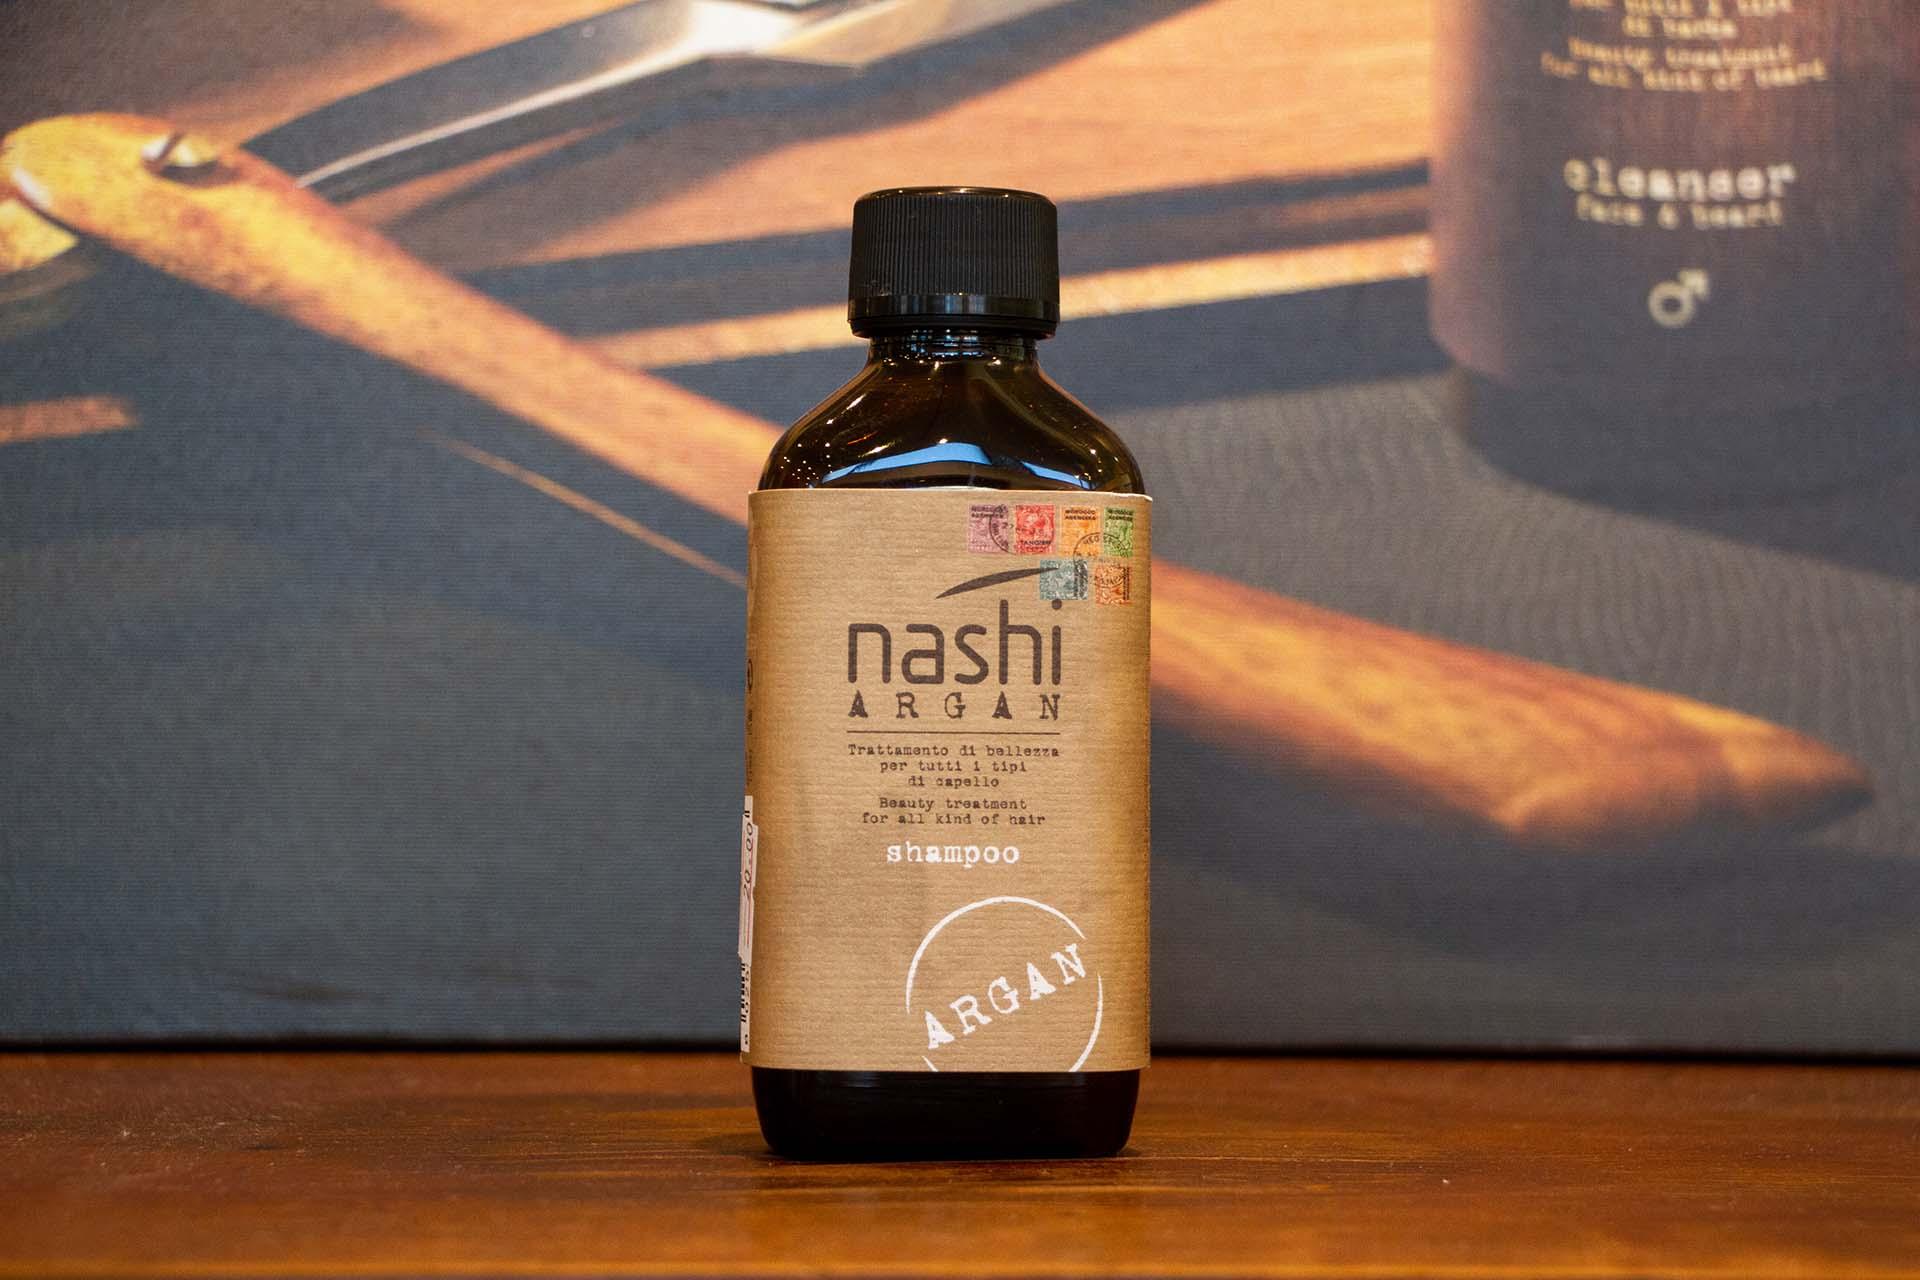 shampo nashi diego staff parrucchieri spinea